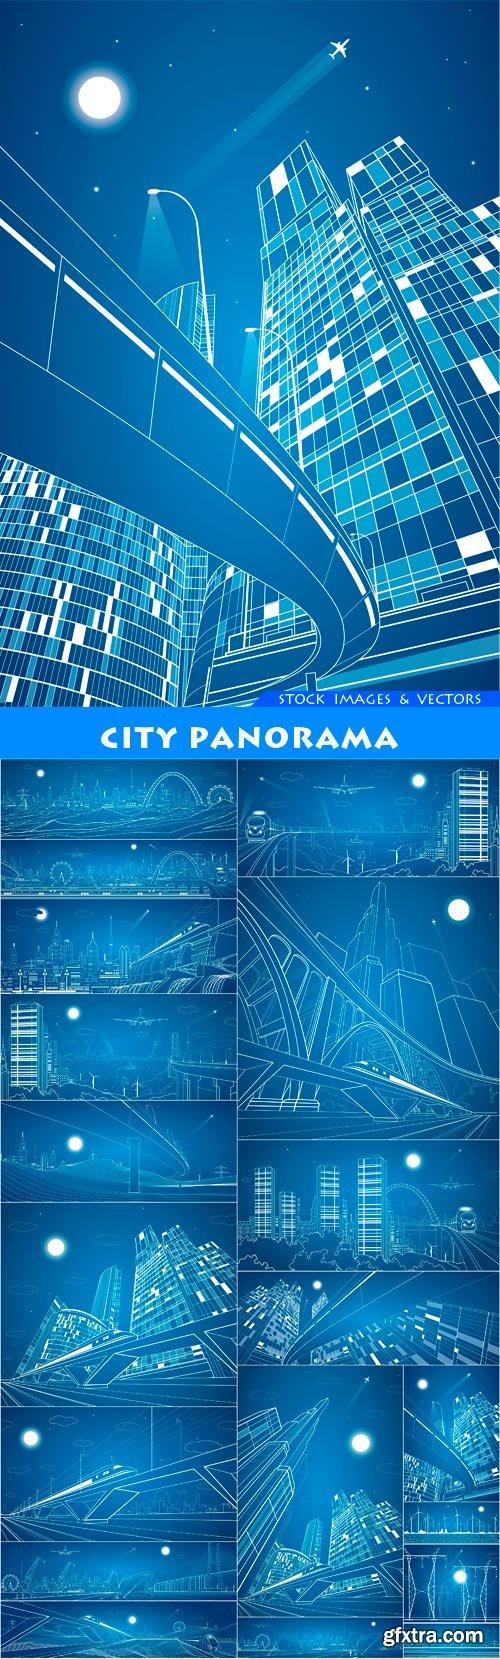 City panorama 19X EPS